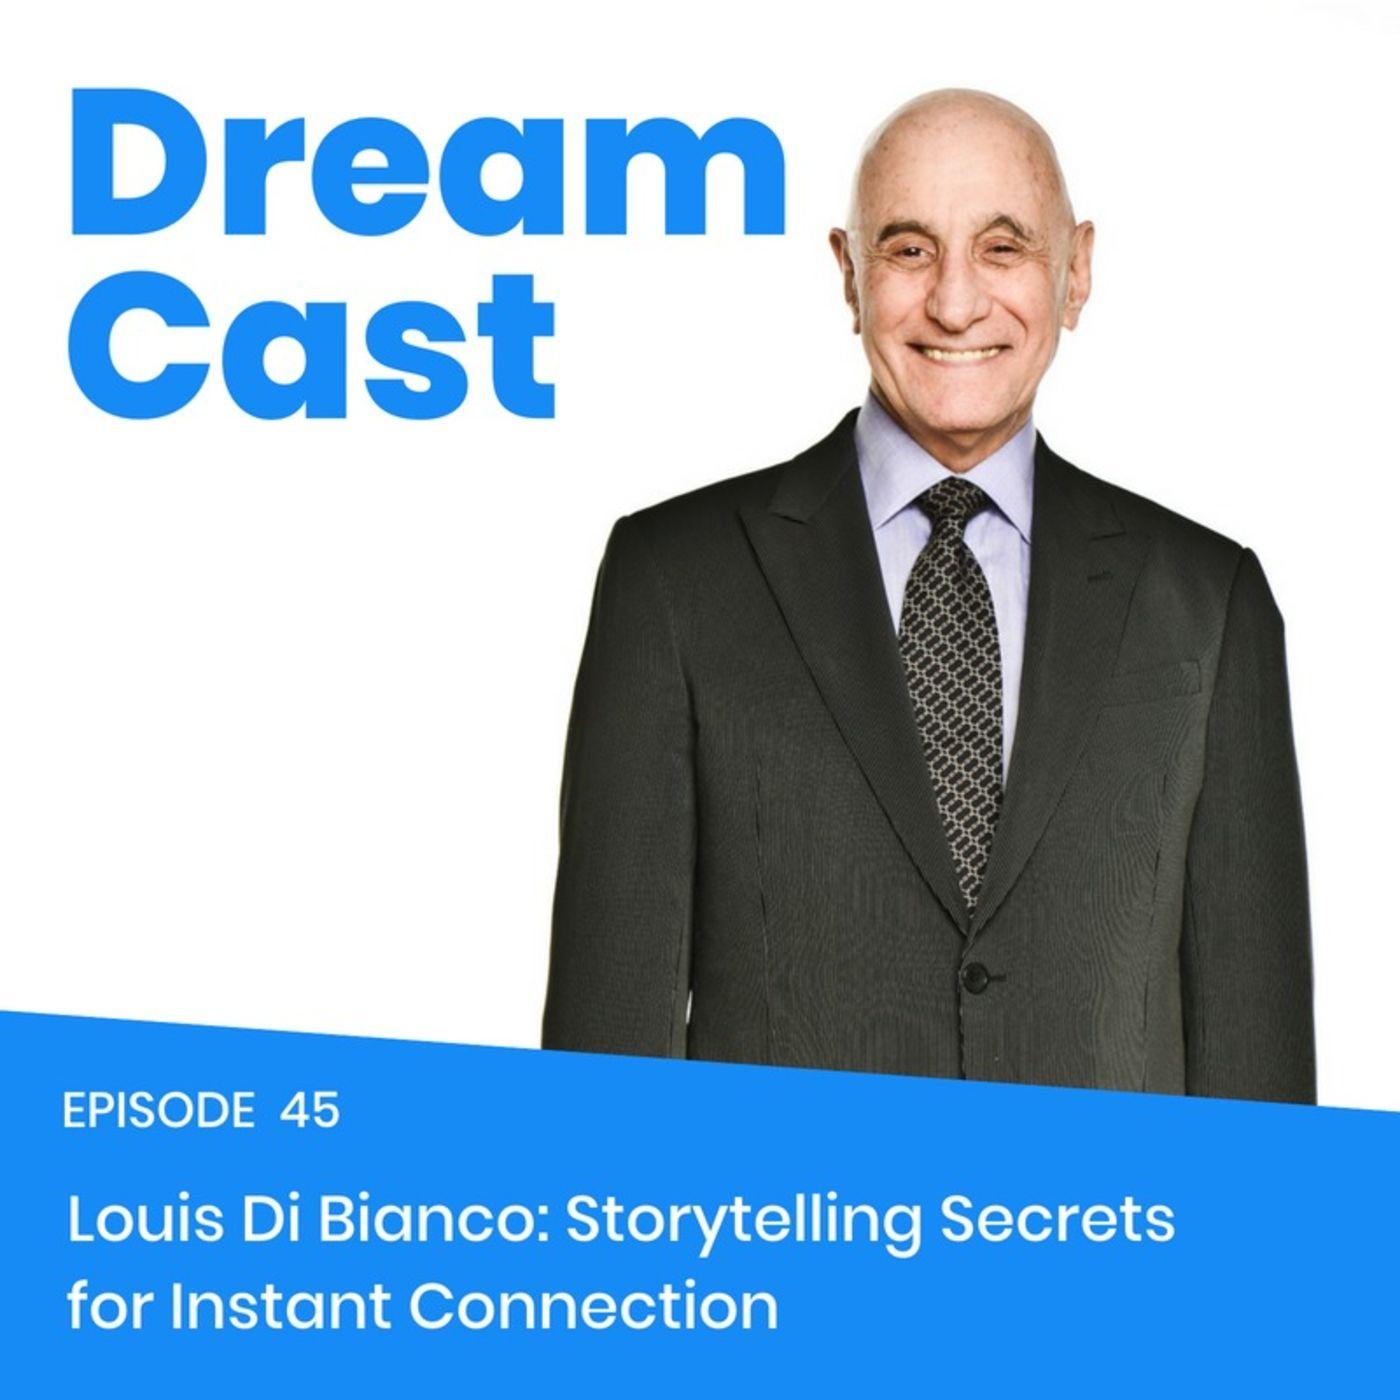 Episode 45 - Louis Di Bianco: Storytelling Secrets for Instant Connection